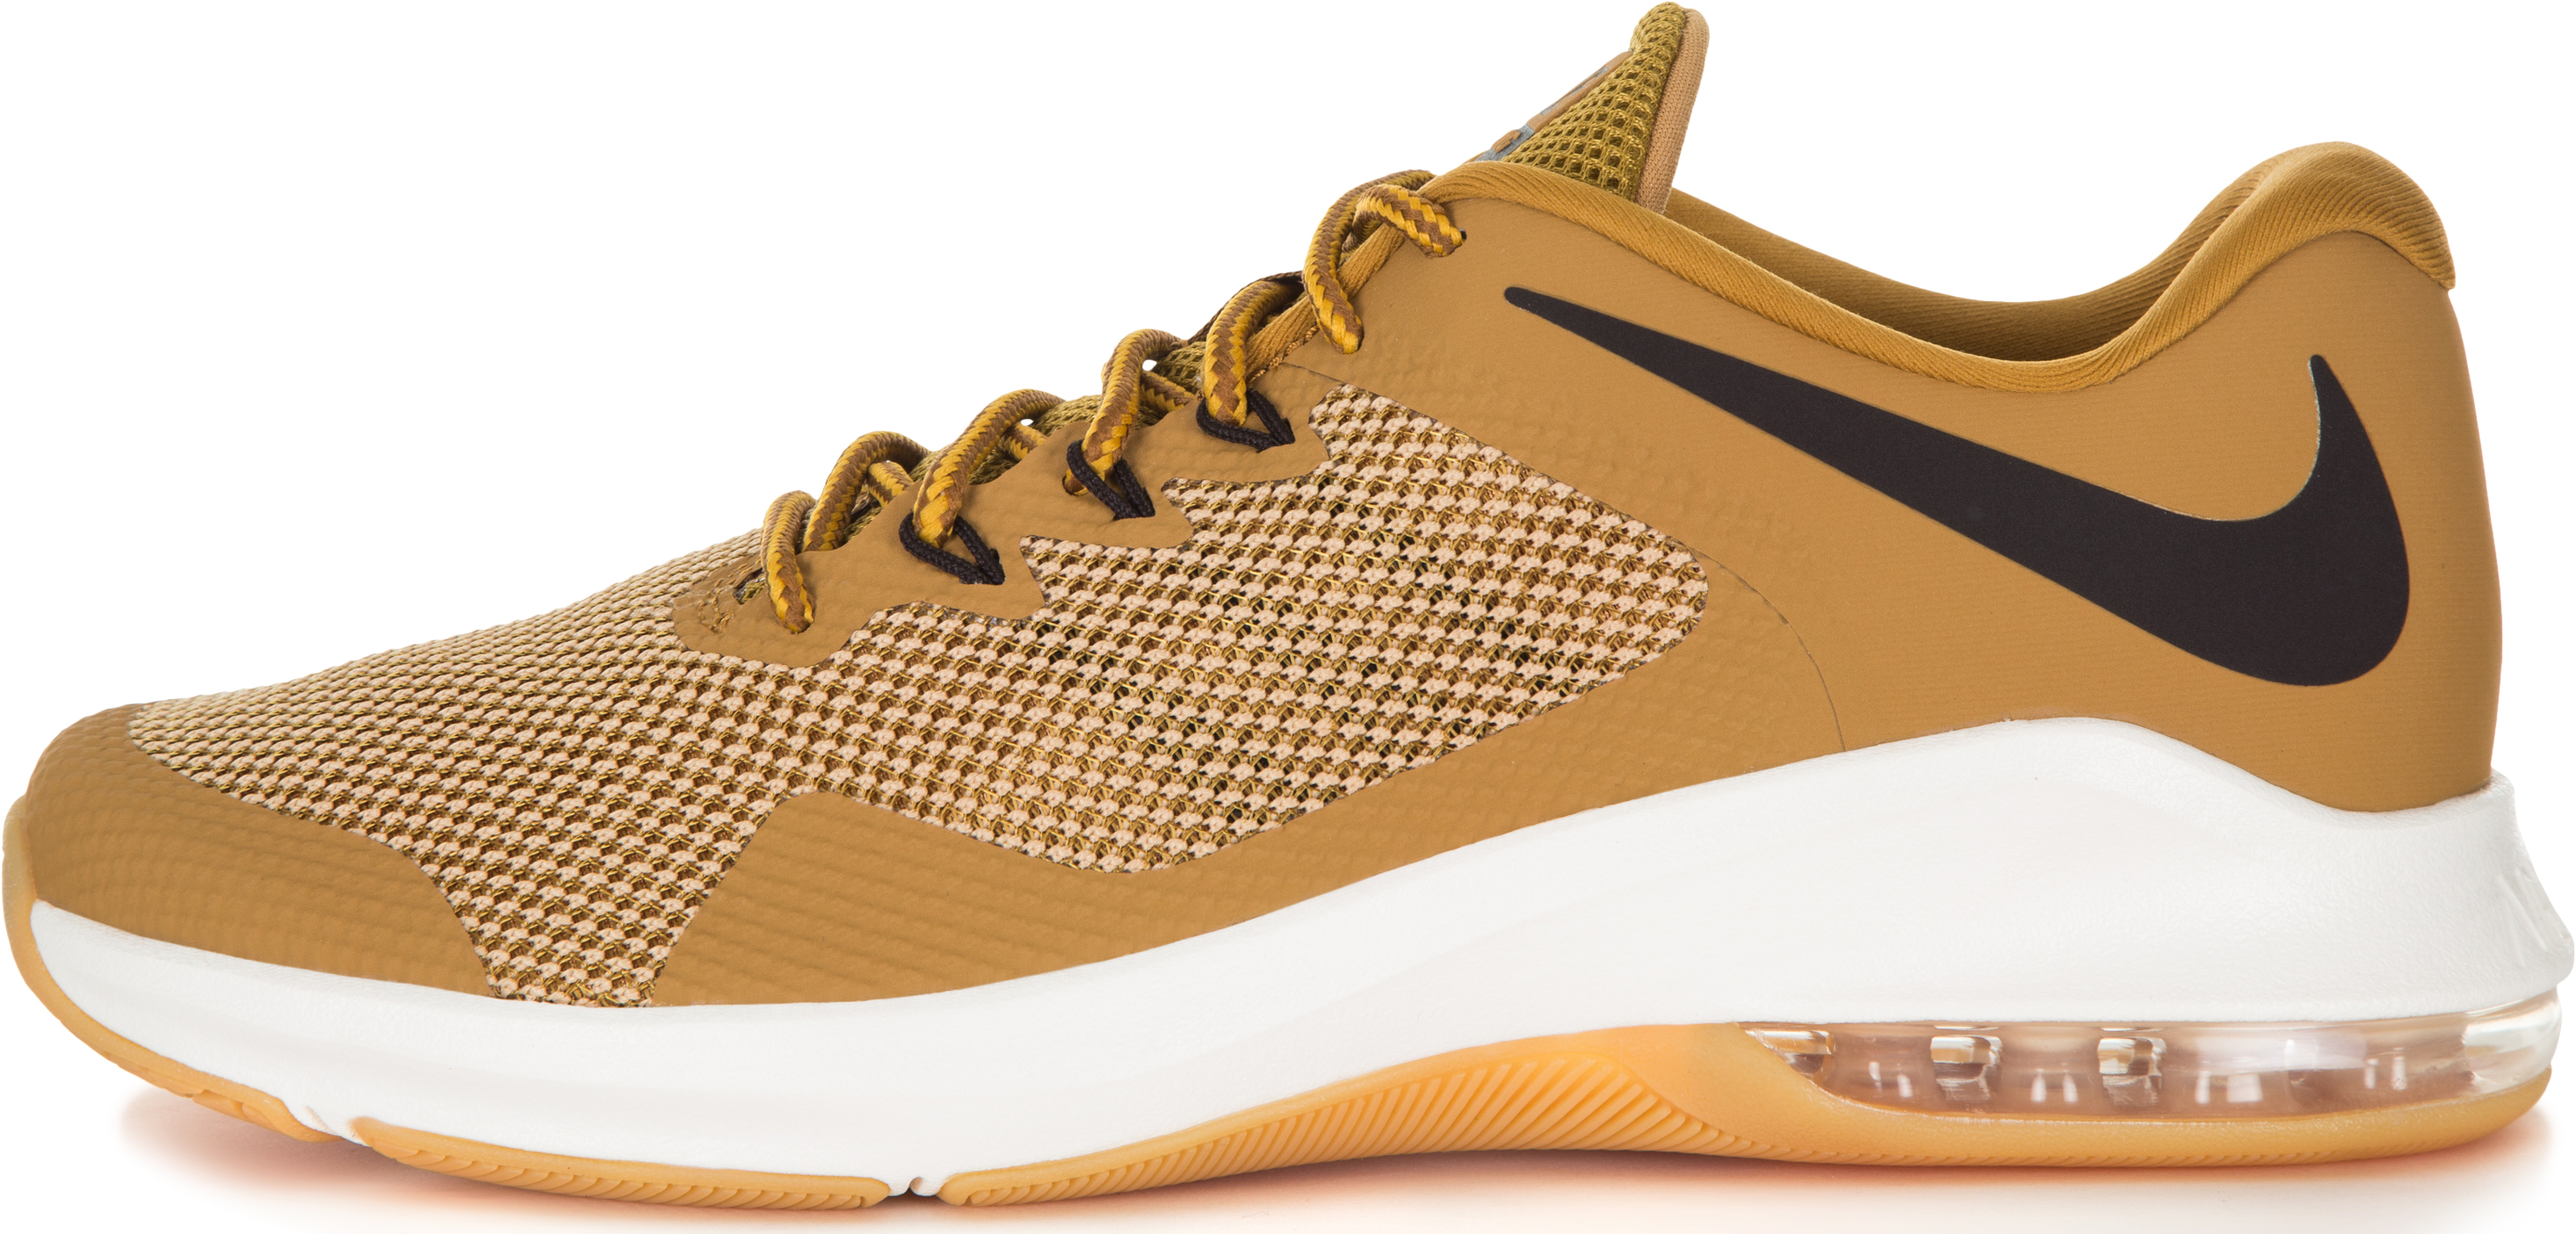 Nike Кроссовки мужские Nike Air Max Alpha Trainer, размер 45 цены онлайн